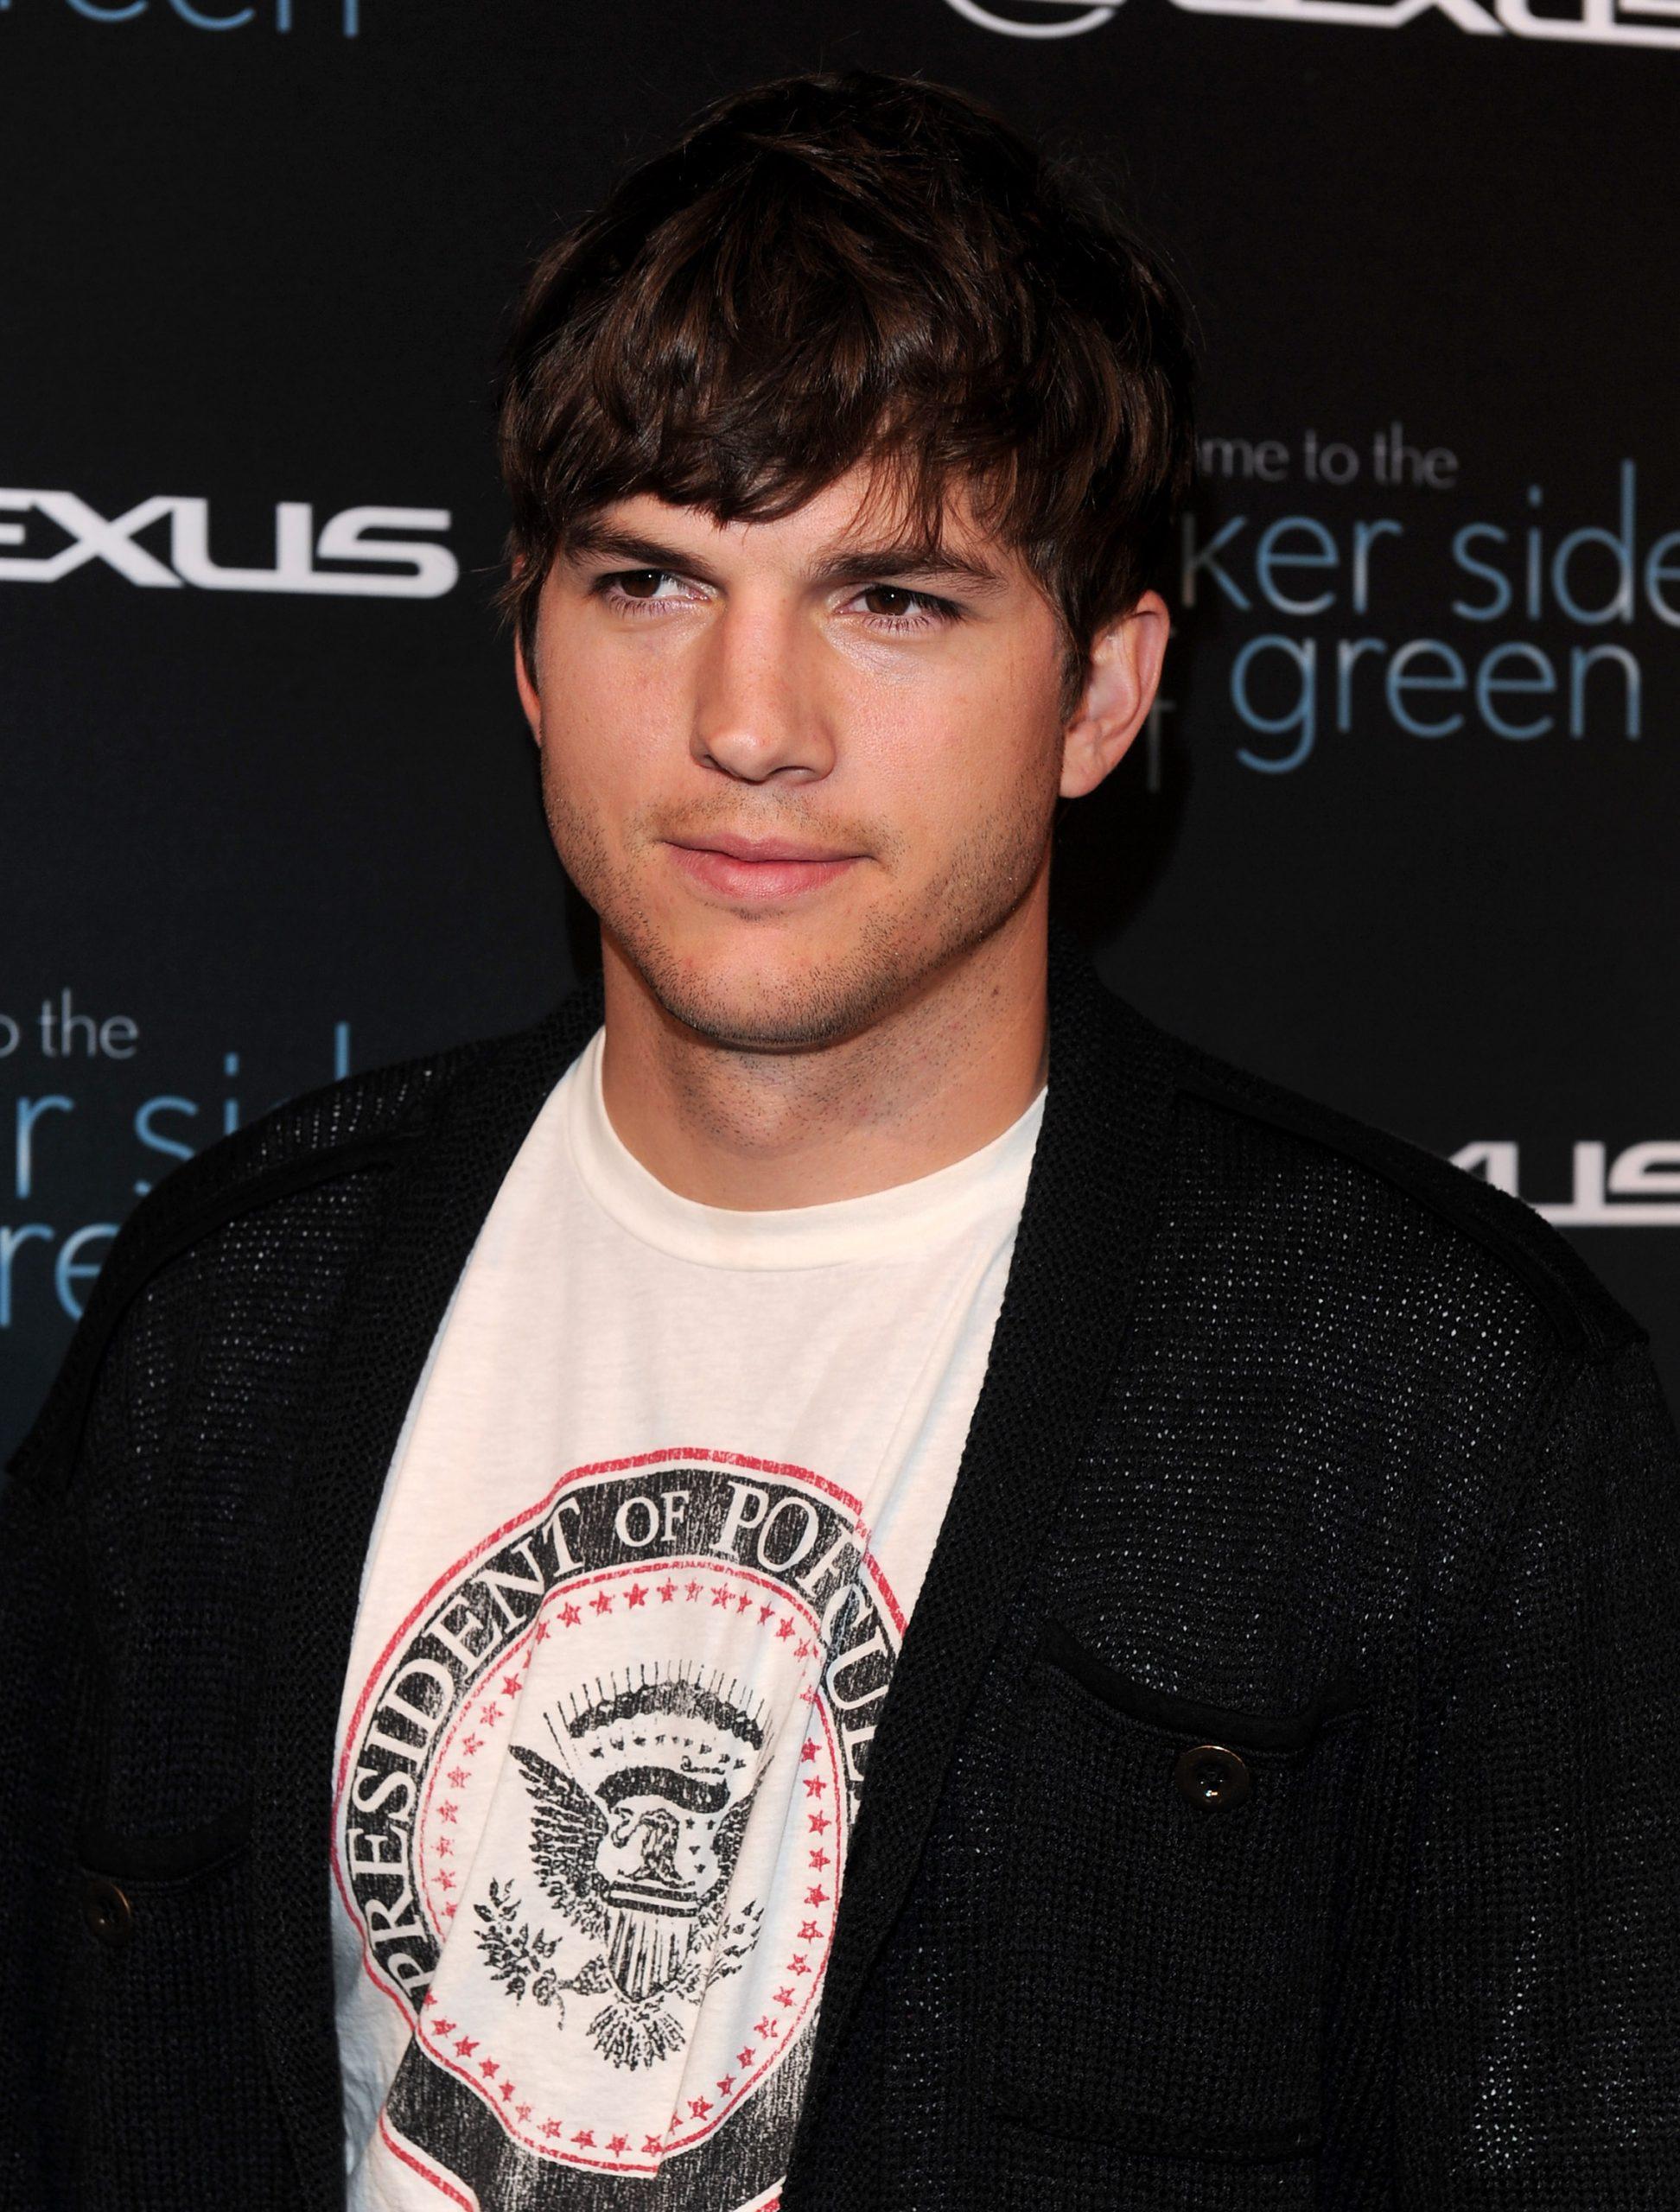 Cambiar de profesión: Ashton Kutcher y otros famosos que lo lograron con éxito.